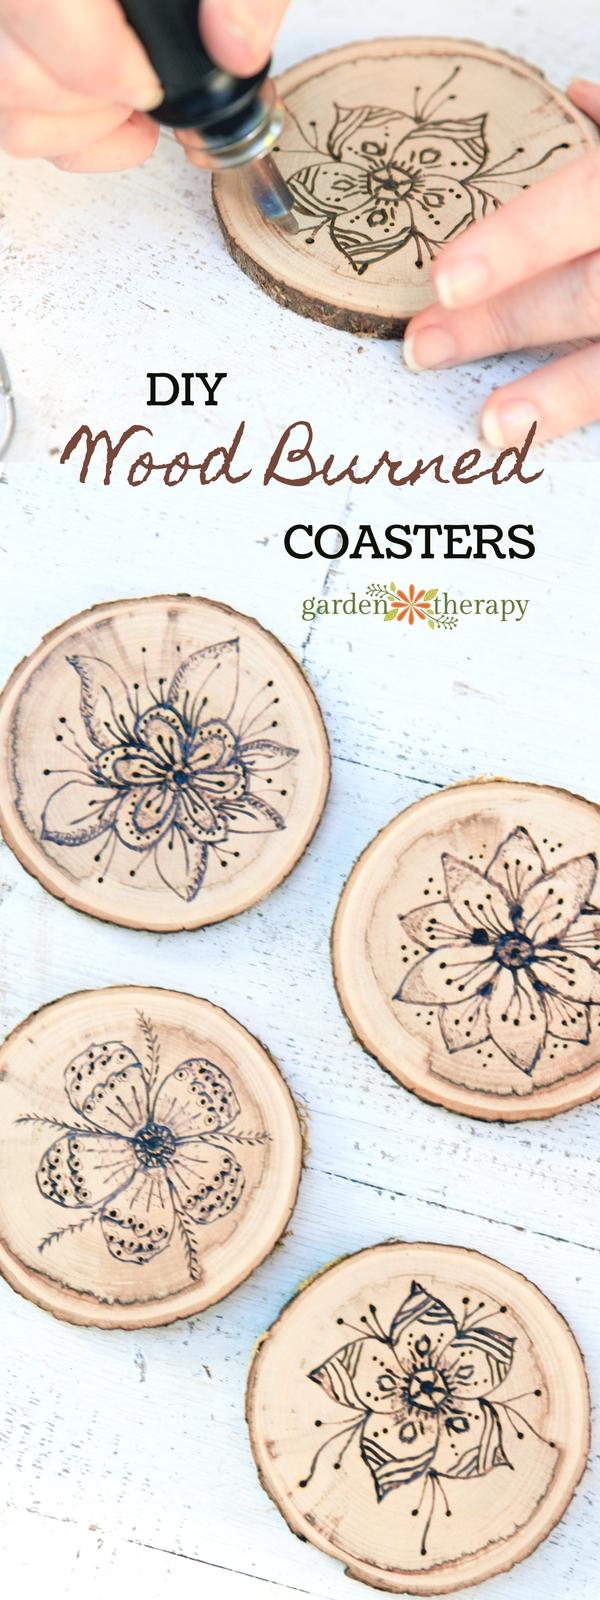 How to Make Wood Burned Coasters